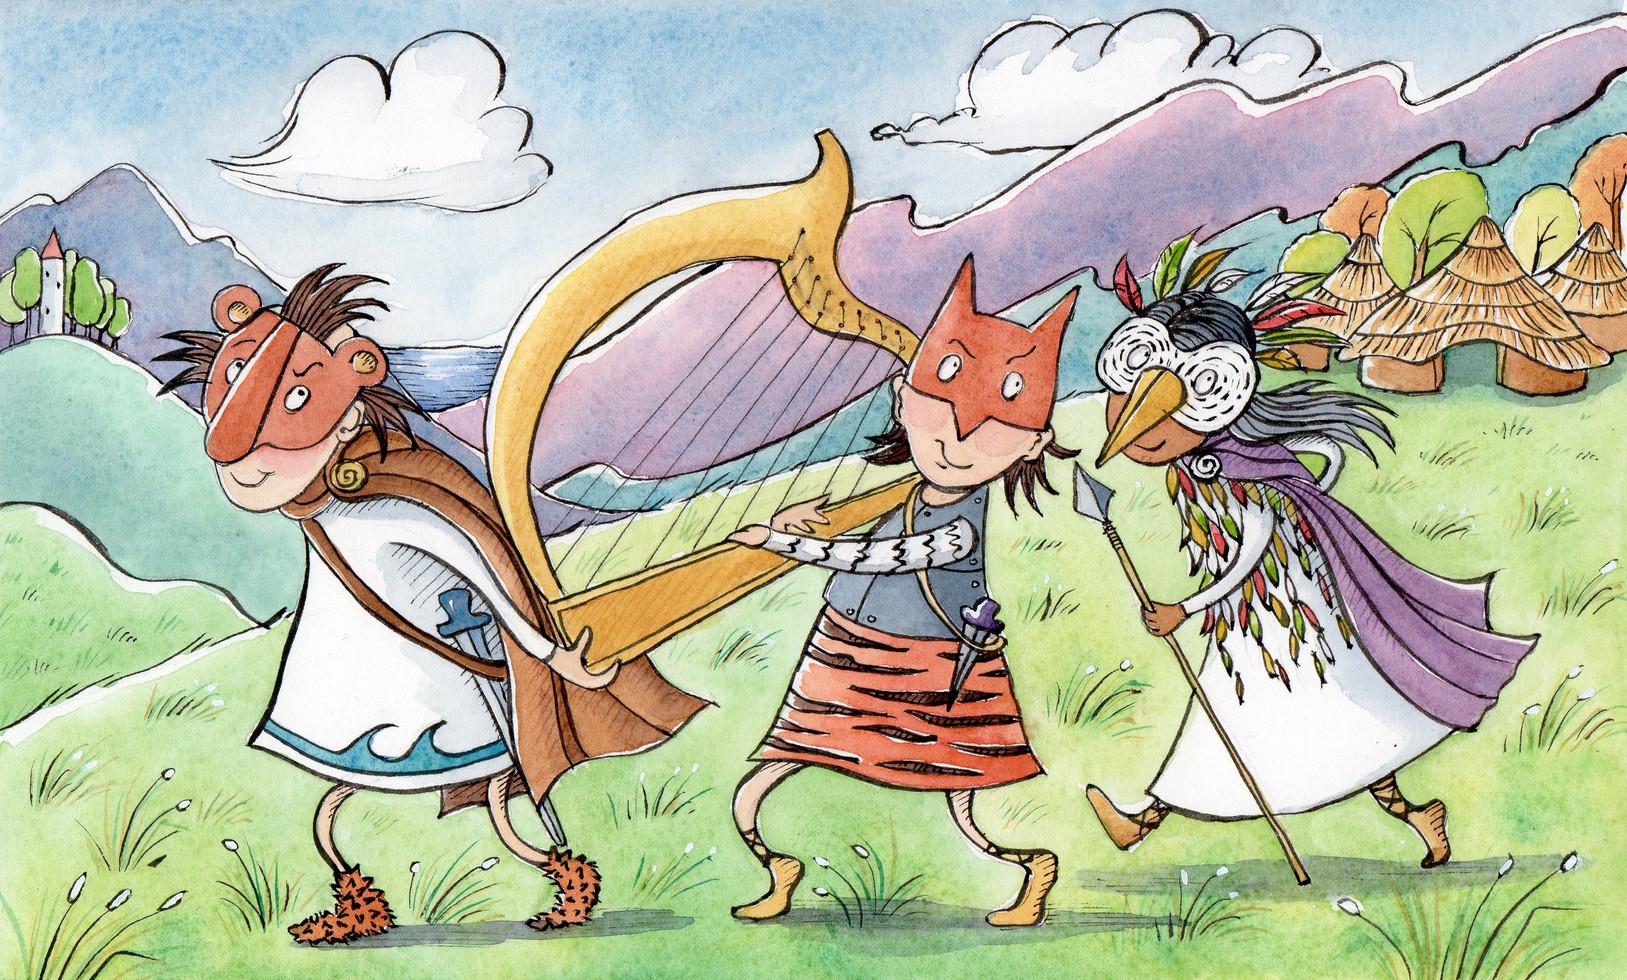 Daghda's Harp verse 3